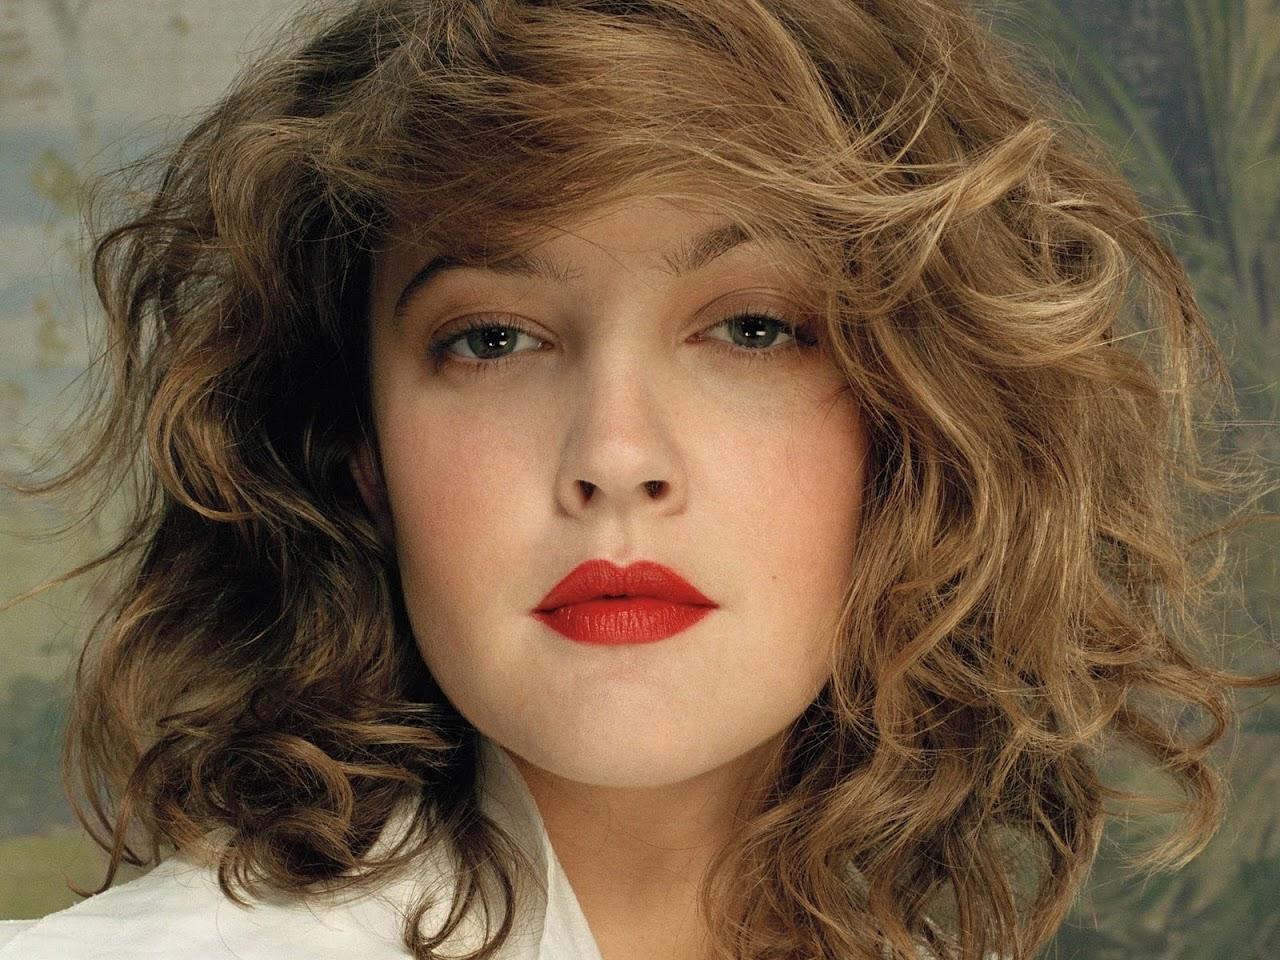 http://3.bp.blogspot.com/_YHwAYfaZ9Xw/TQVc1Dzcr9I/AAAAAAAAAI4/qTlZG0E_af0/s1600/drew-barrymore-red-lips.jpg